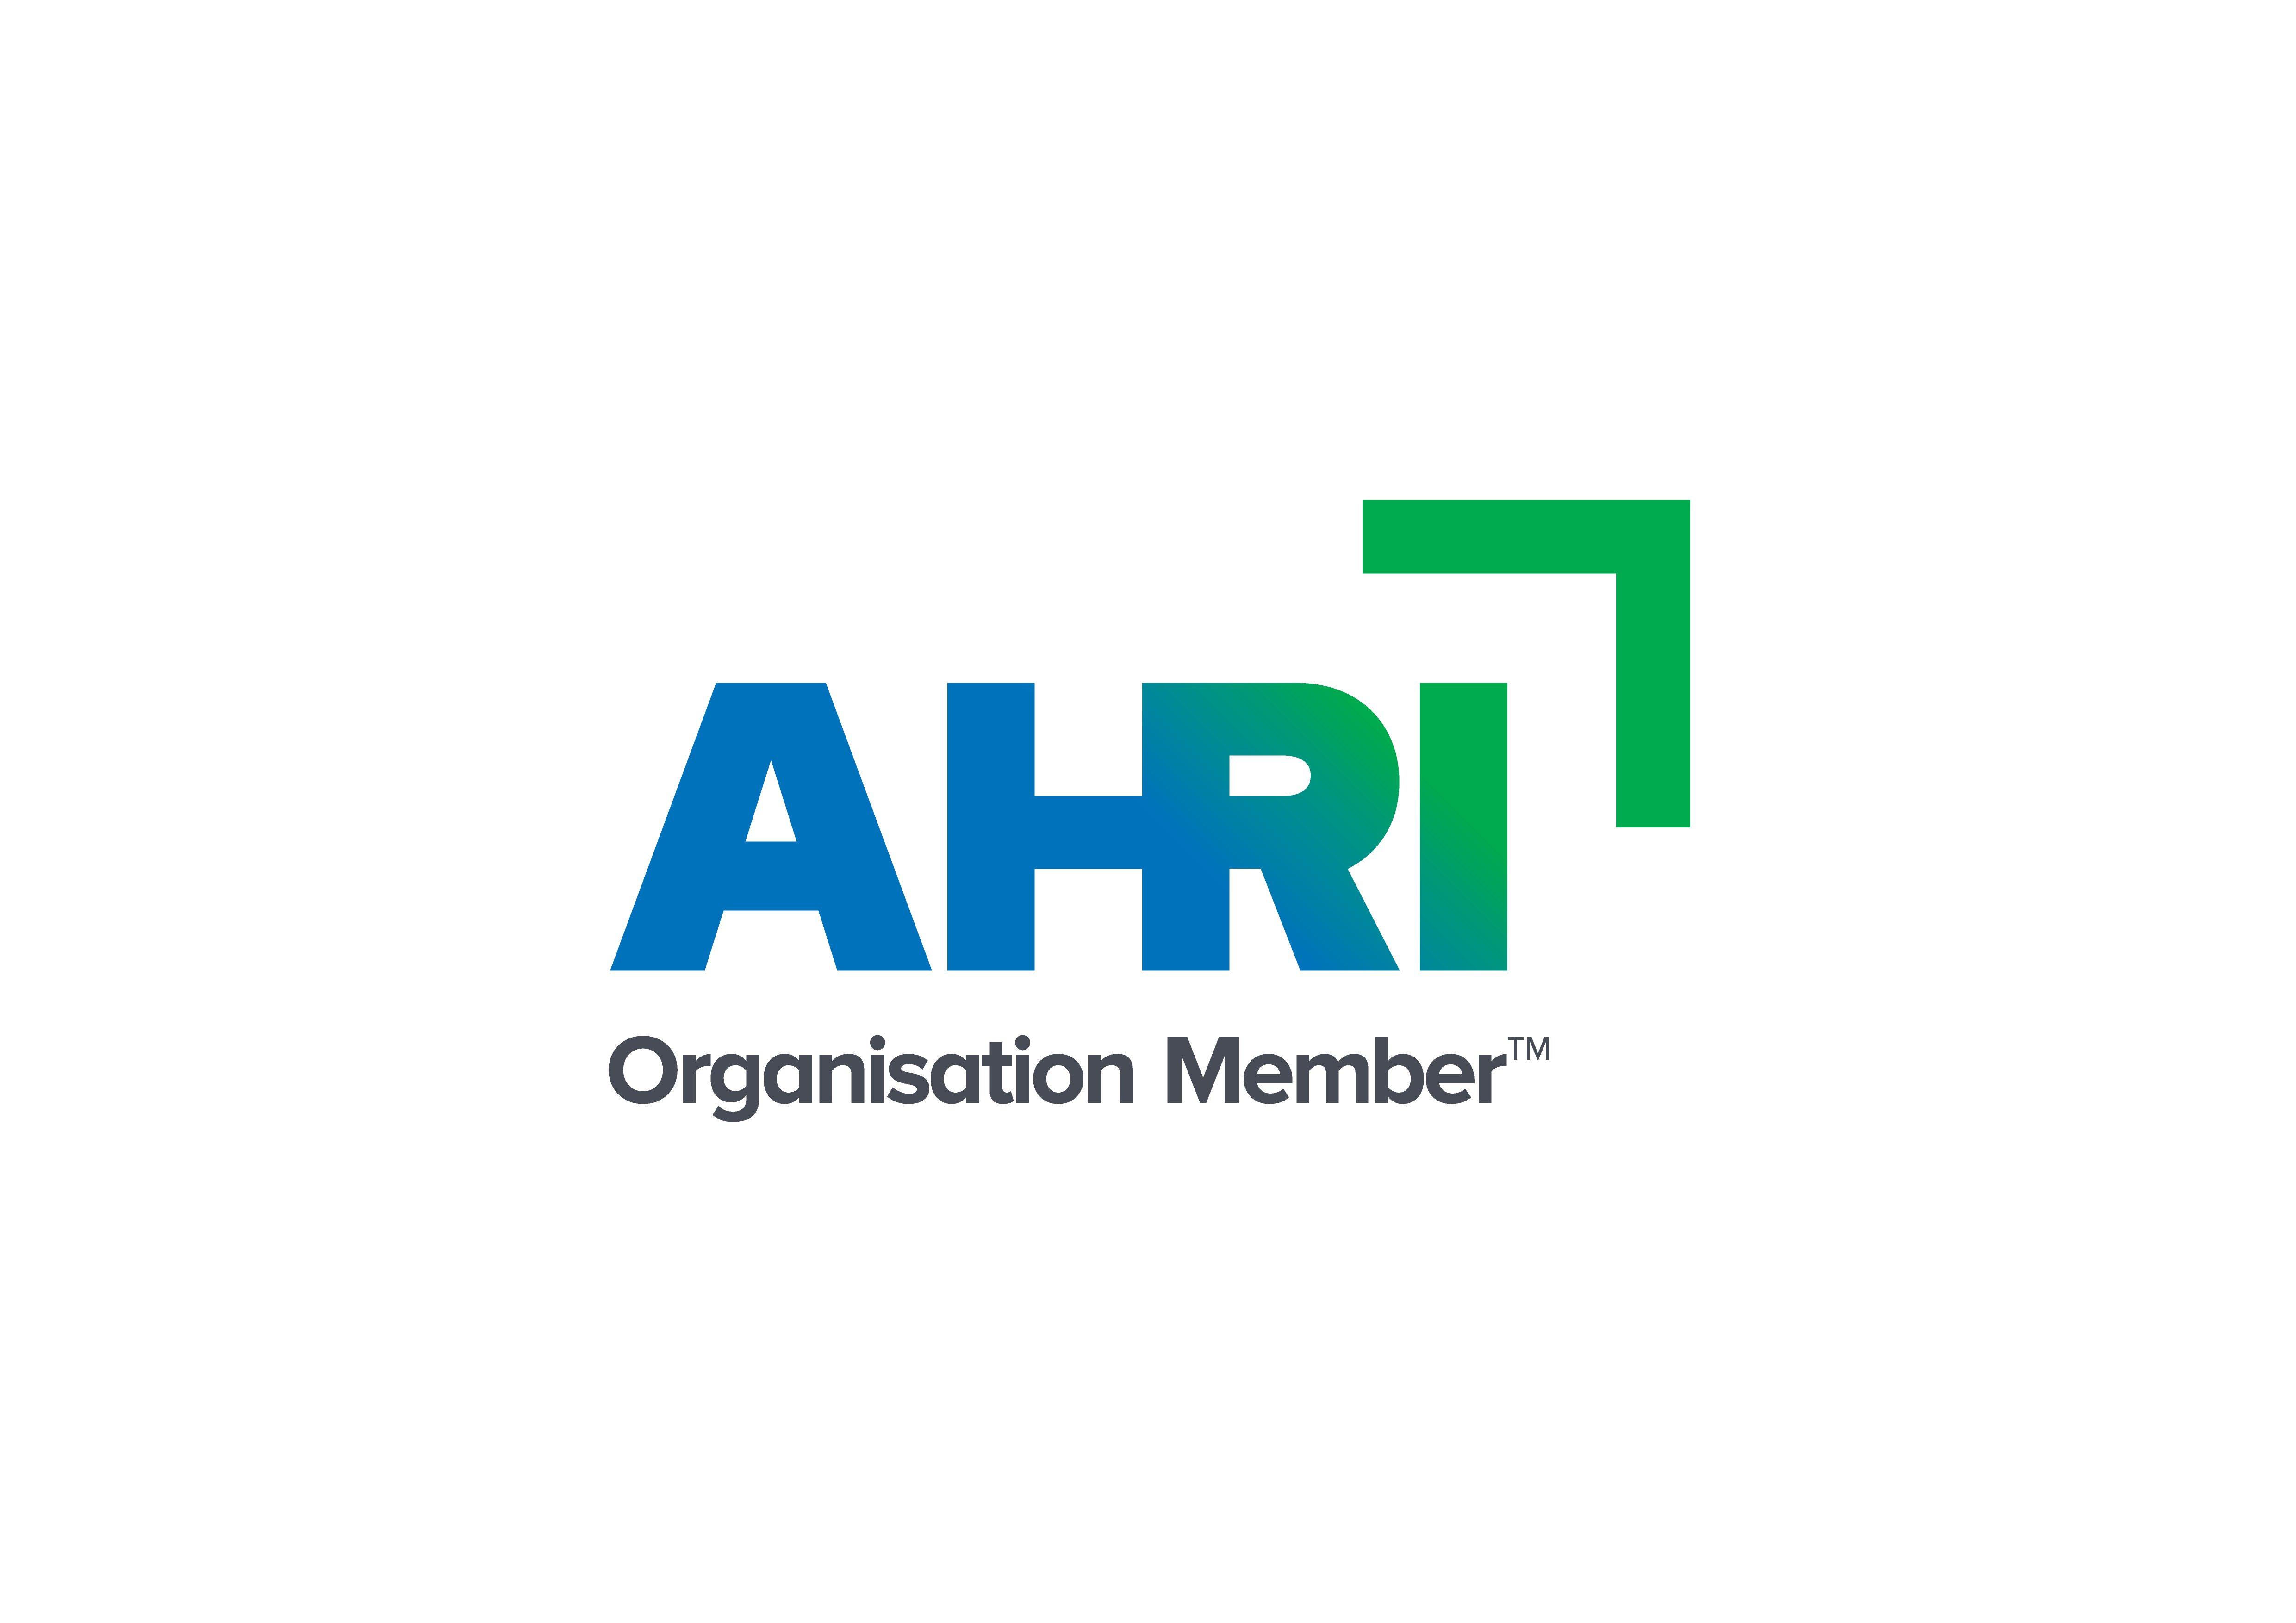 AHRI organisation member